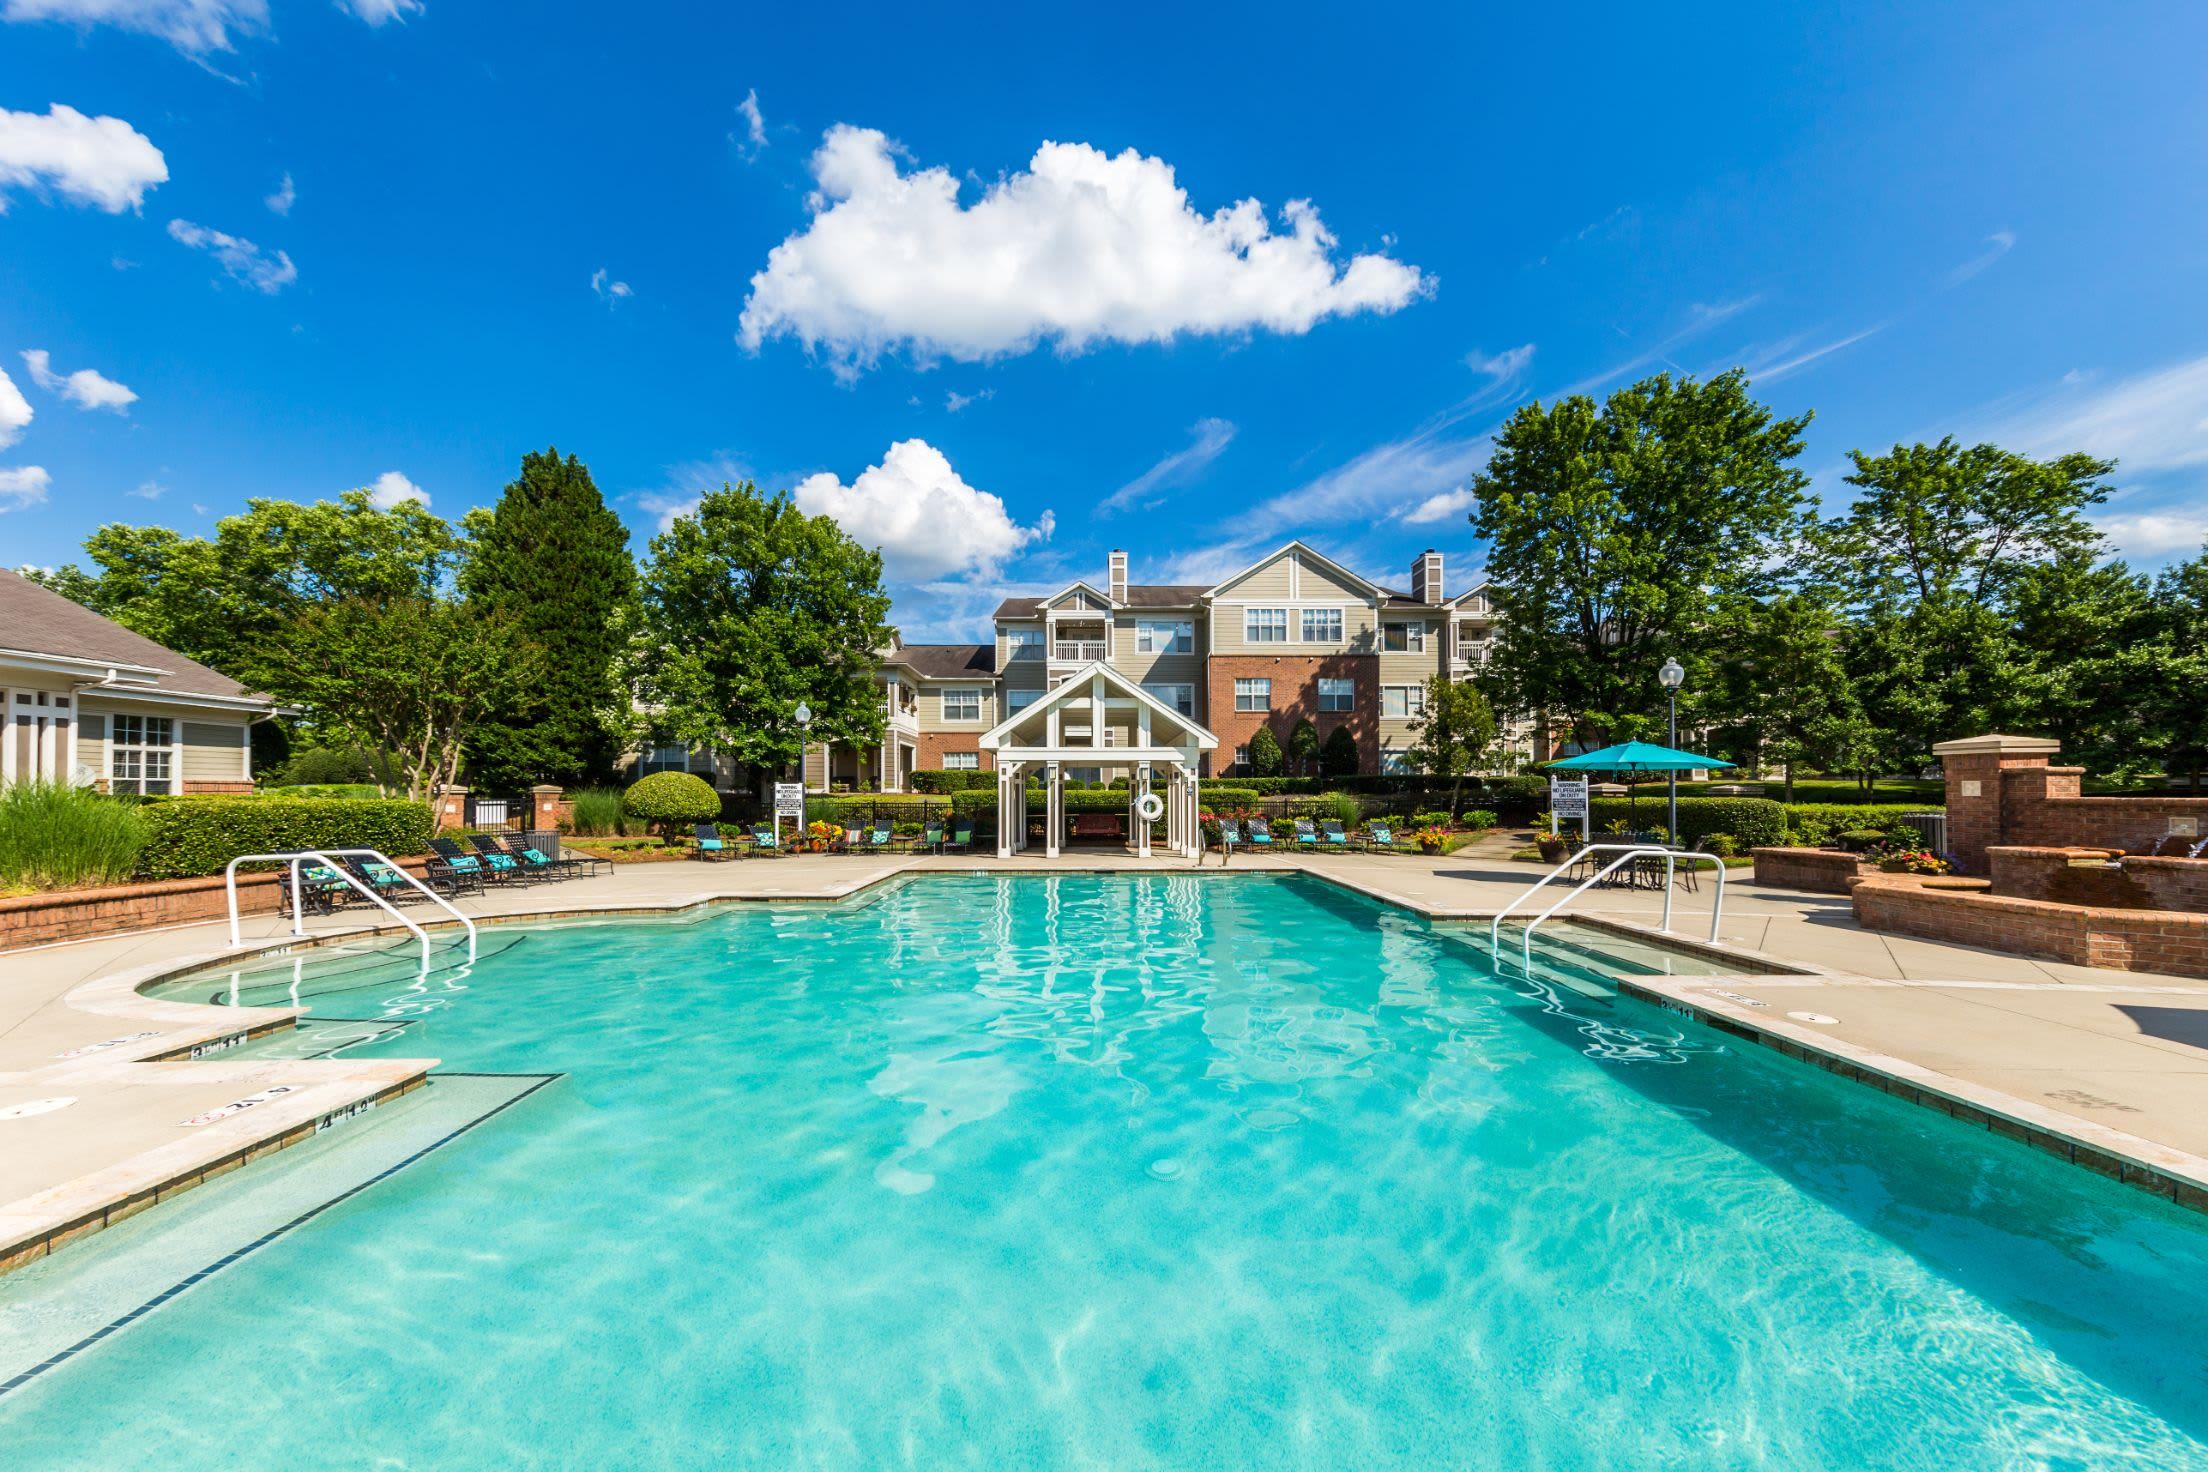 Spakling swimming pool at The Preserve at Ballantyne Commons in Charlotte, North Carolina